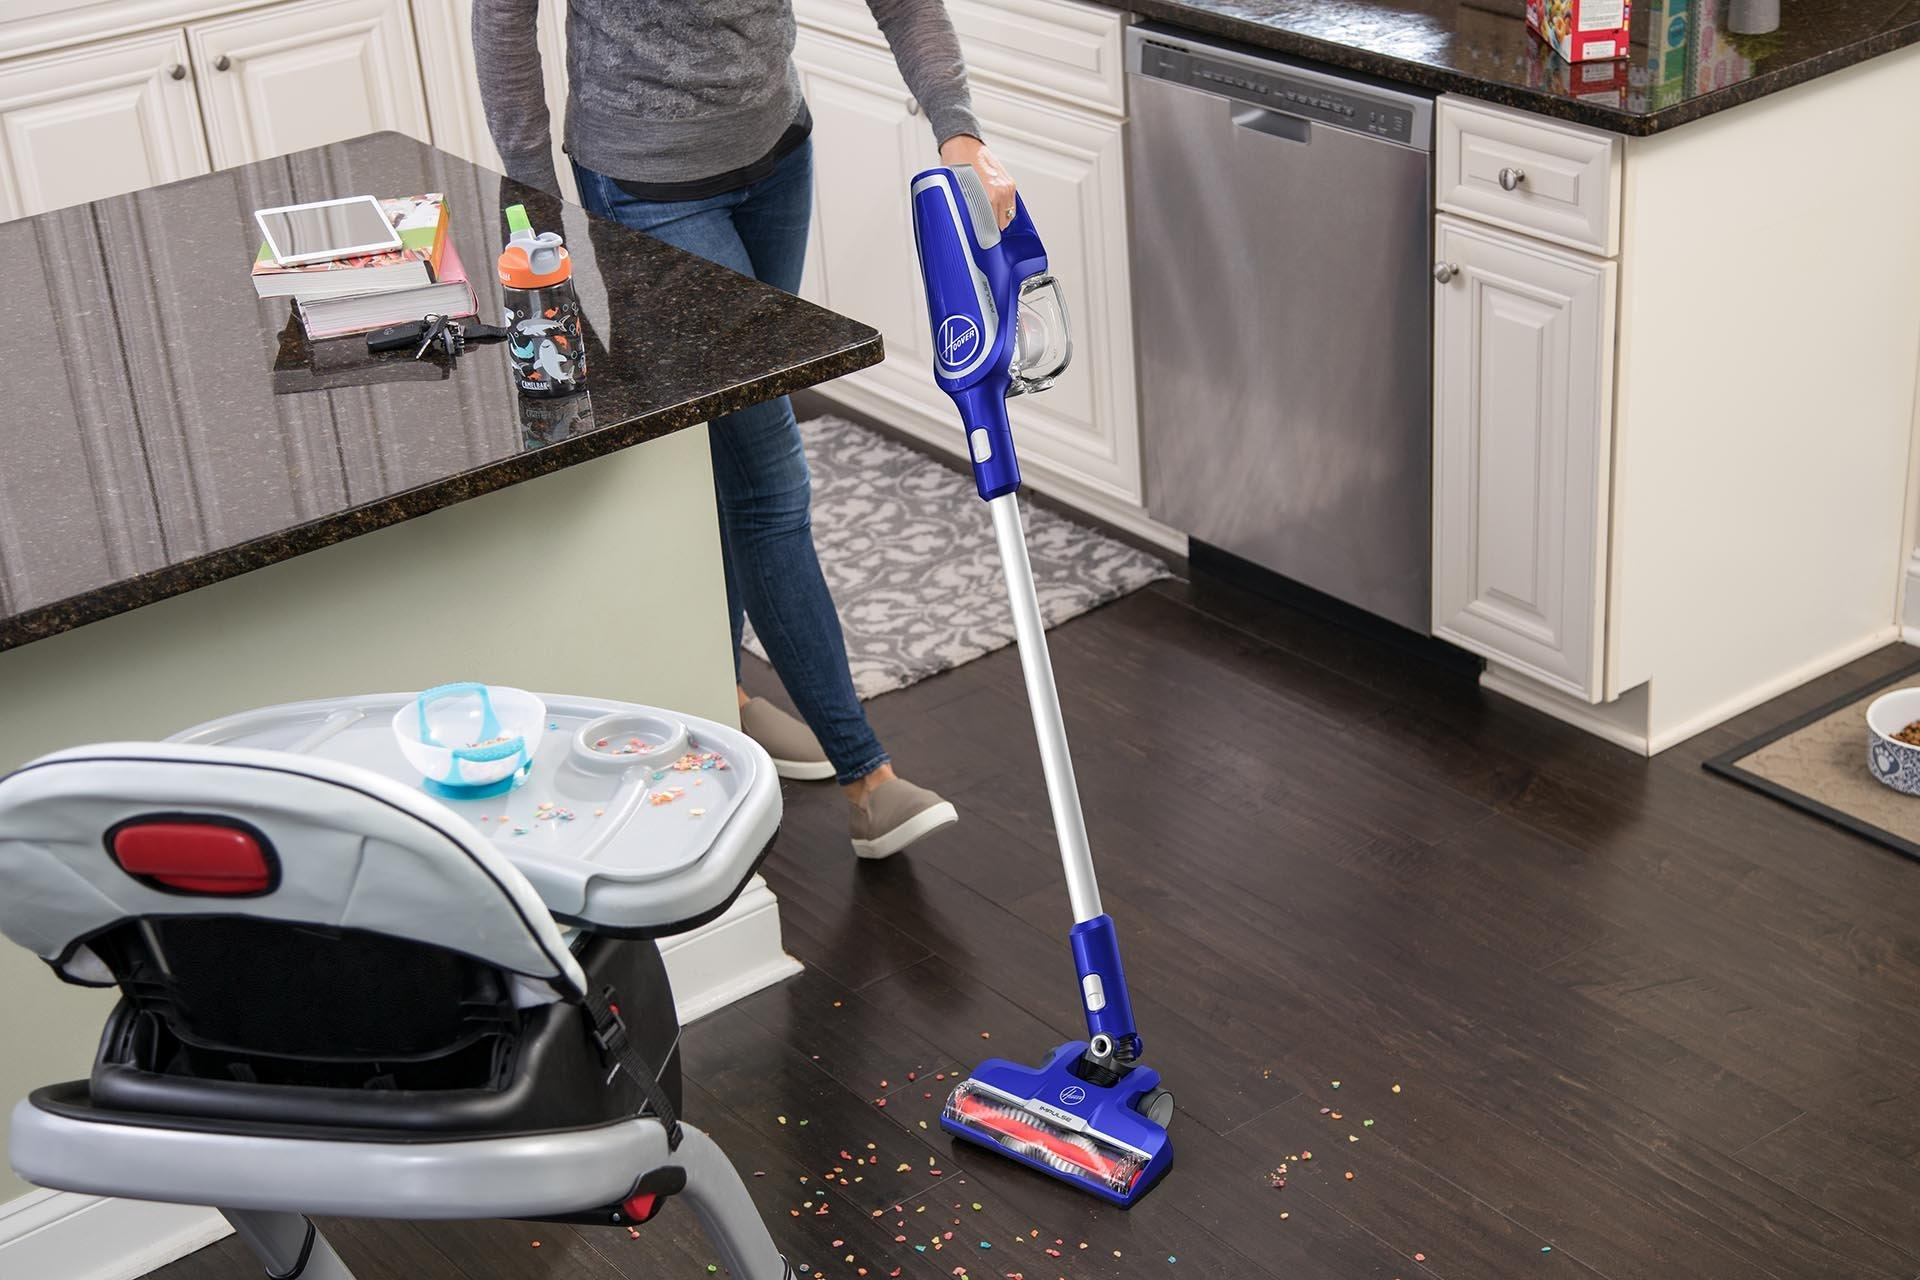 Hoover IMPULSE Cordless Vacuum10